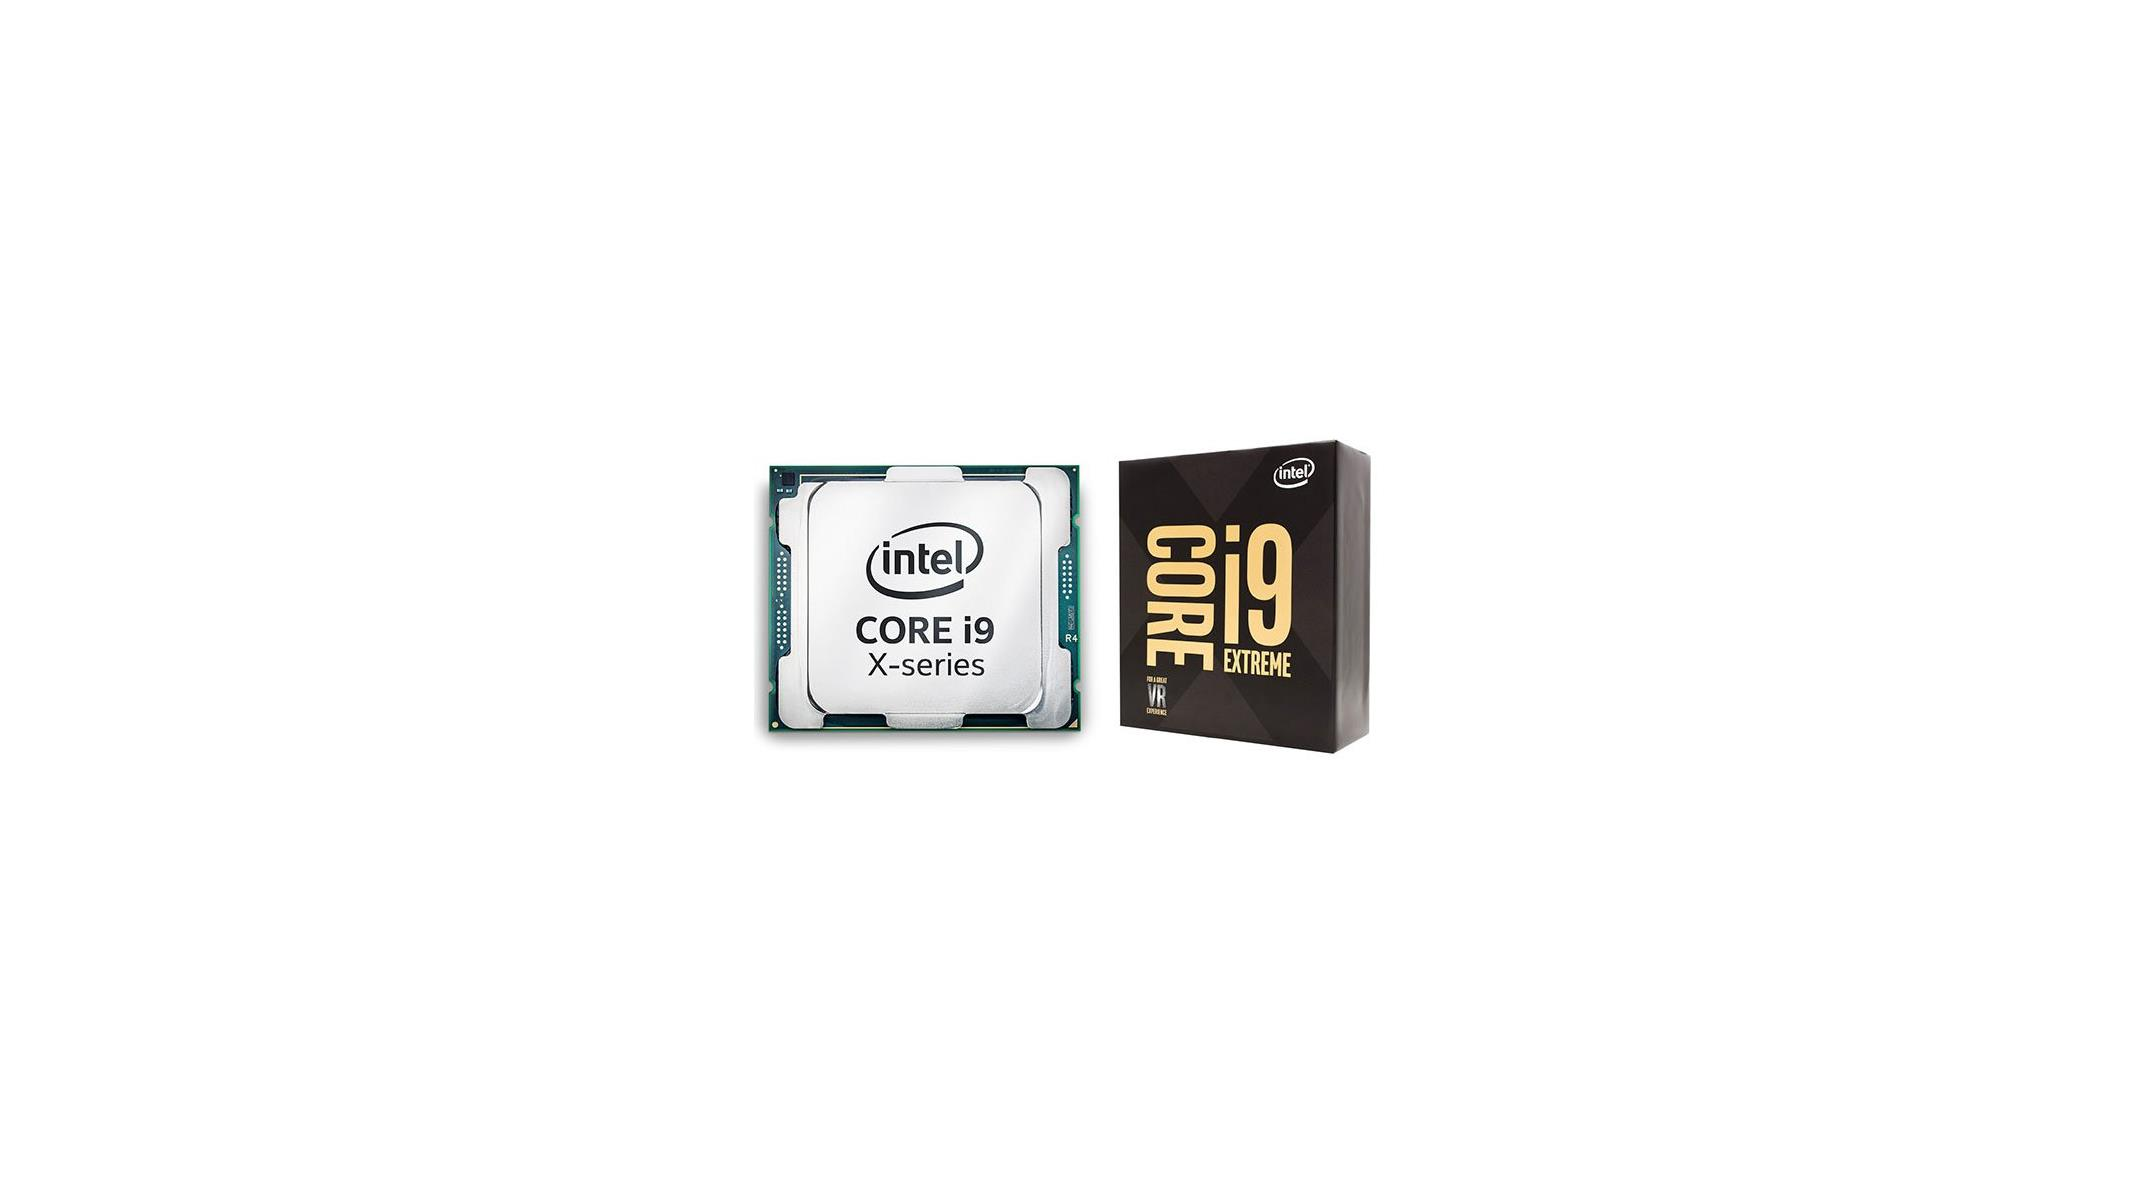 Intel's Core i9-7980XE Skylake-X 18-Core Beast CPU